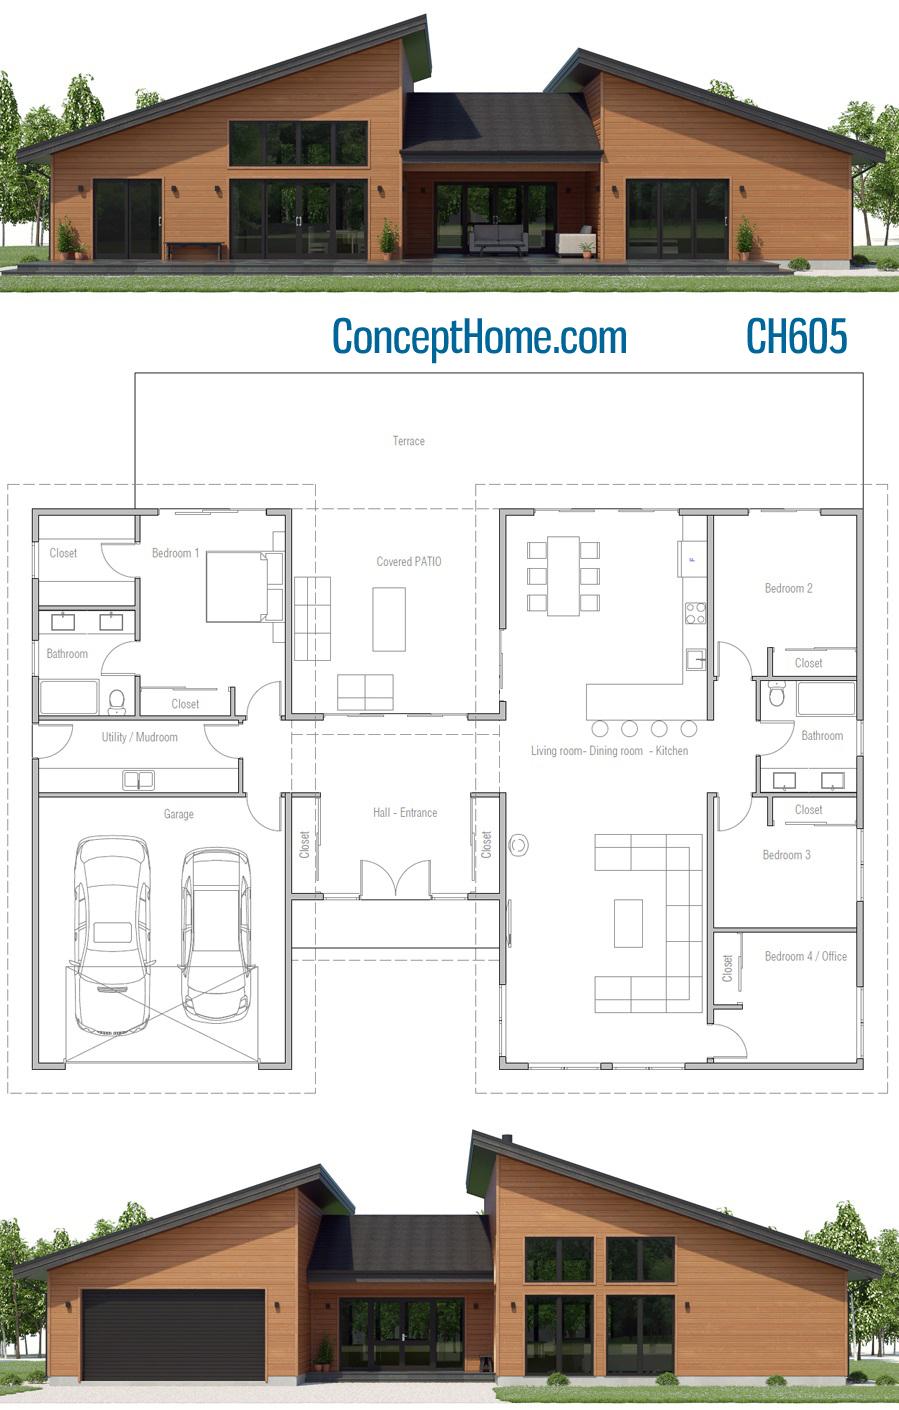 House Design Ch605 House Plan Gallery Farmhouse Style House Plans Affordable House Plans